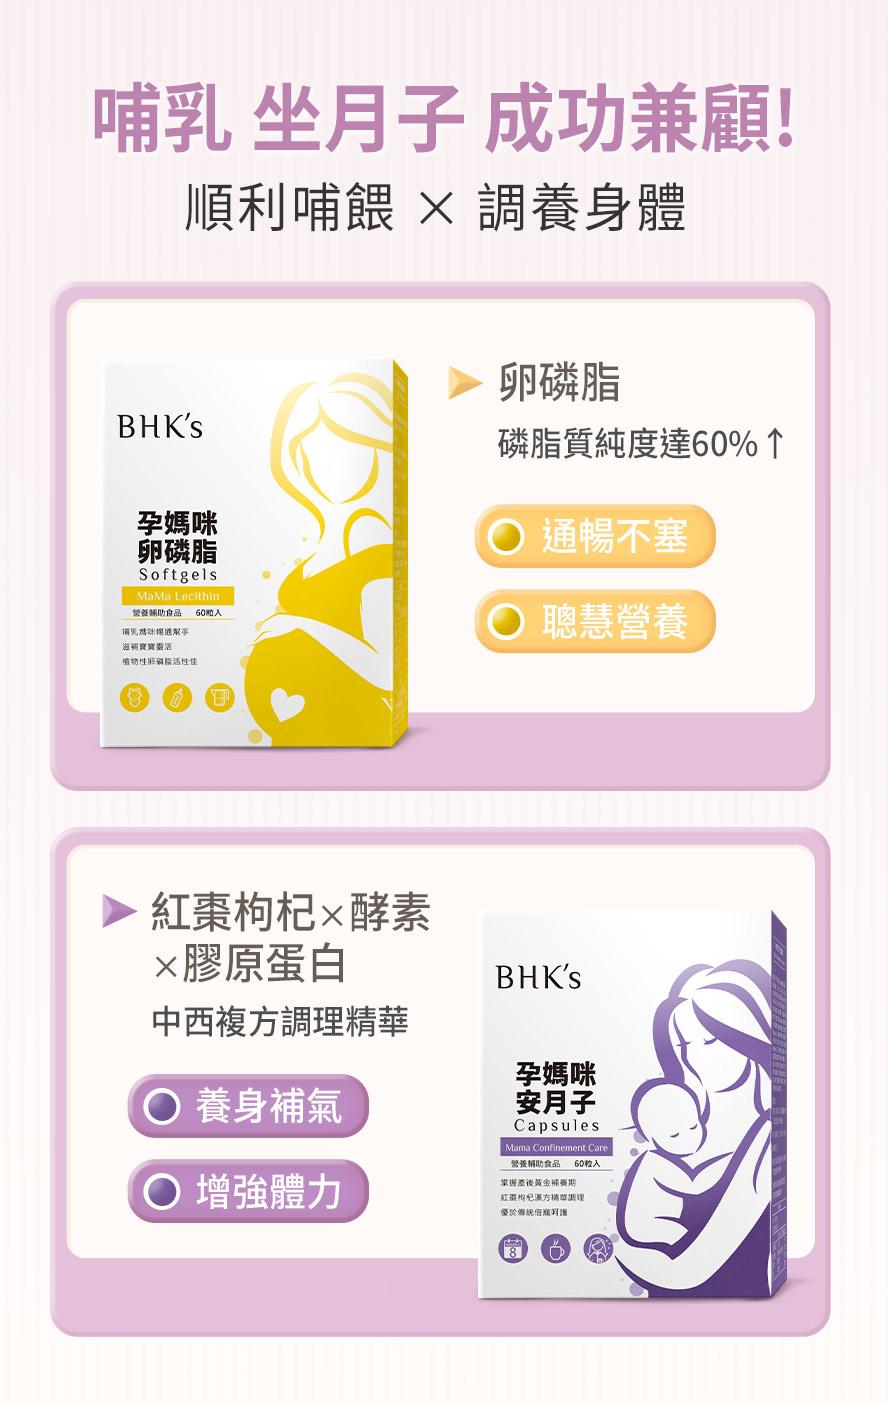 BHK嚴選全球第一品質的卵磷脂,成功解決哺乳問題;坐月子、小產後的養生食補選擇BHK安月子。